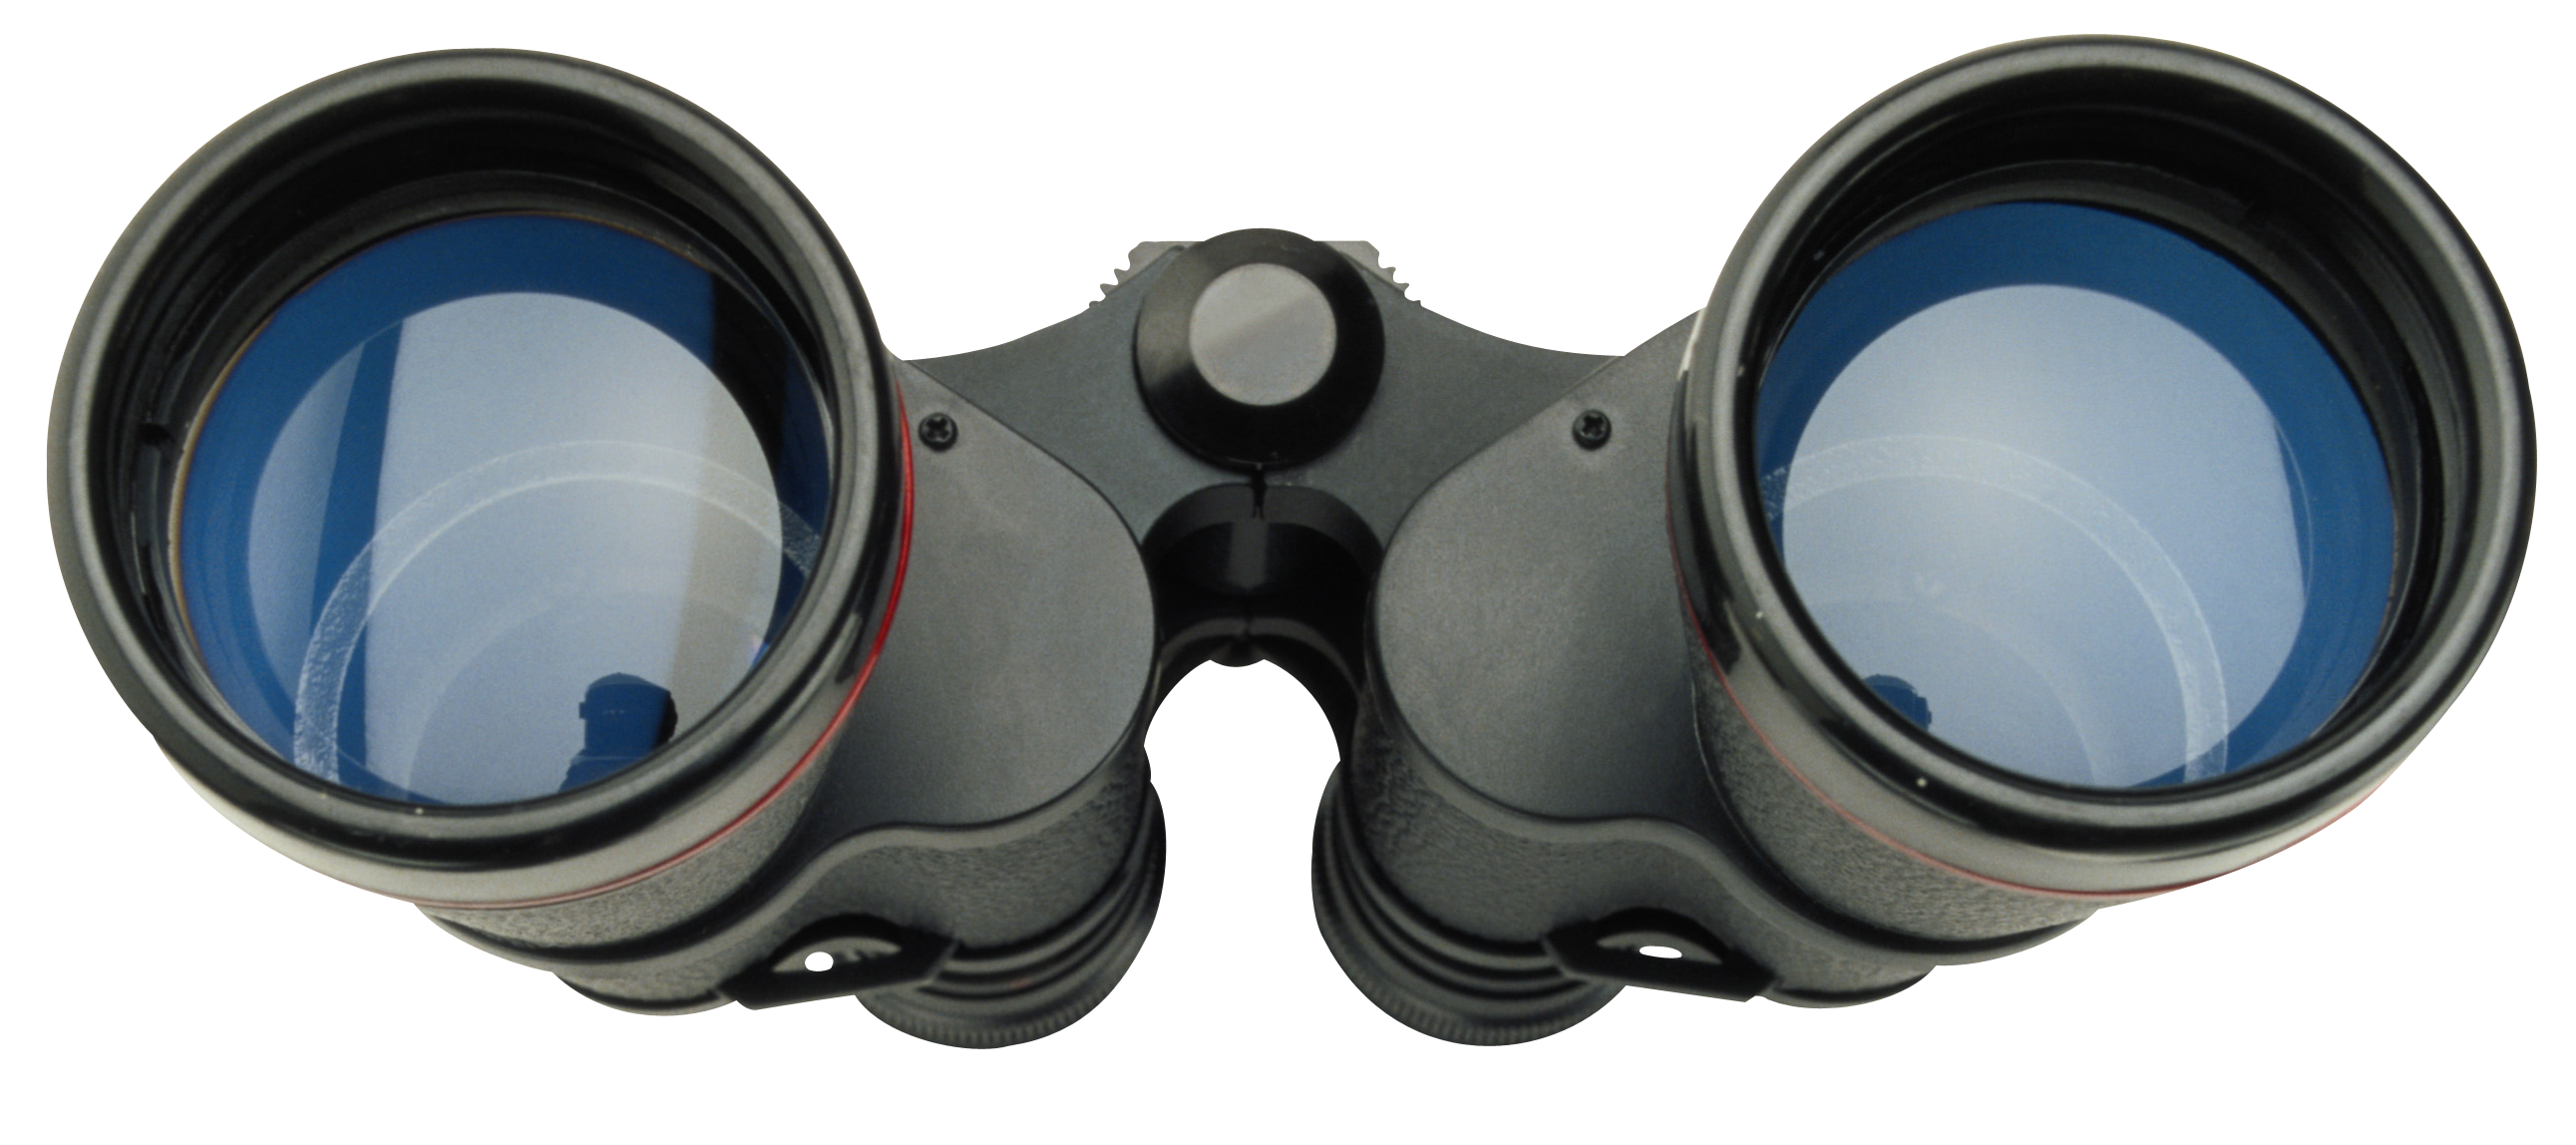 Focus clipart binoculars. Binocular high quality png